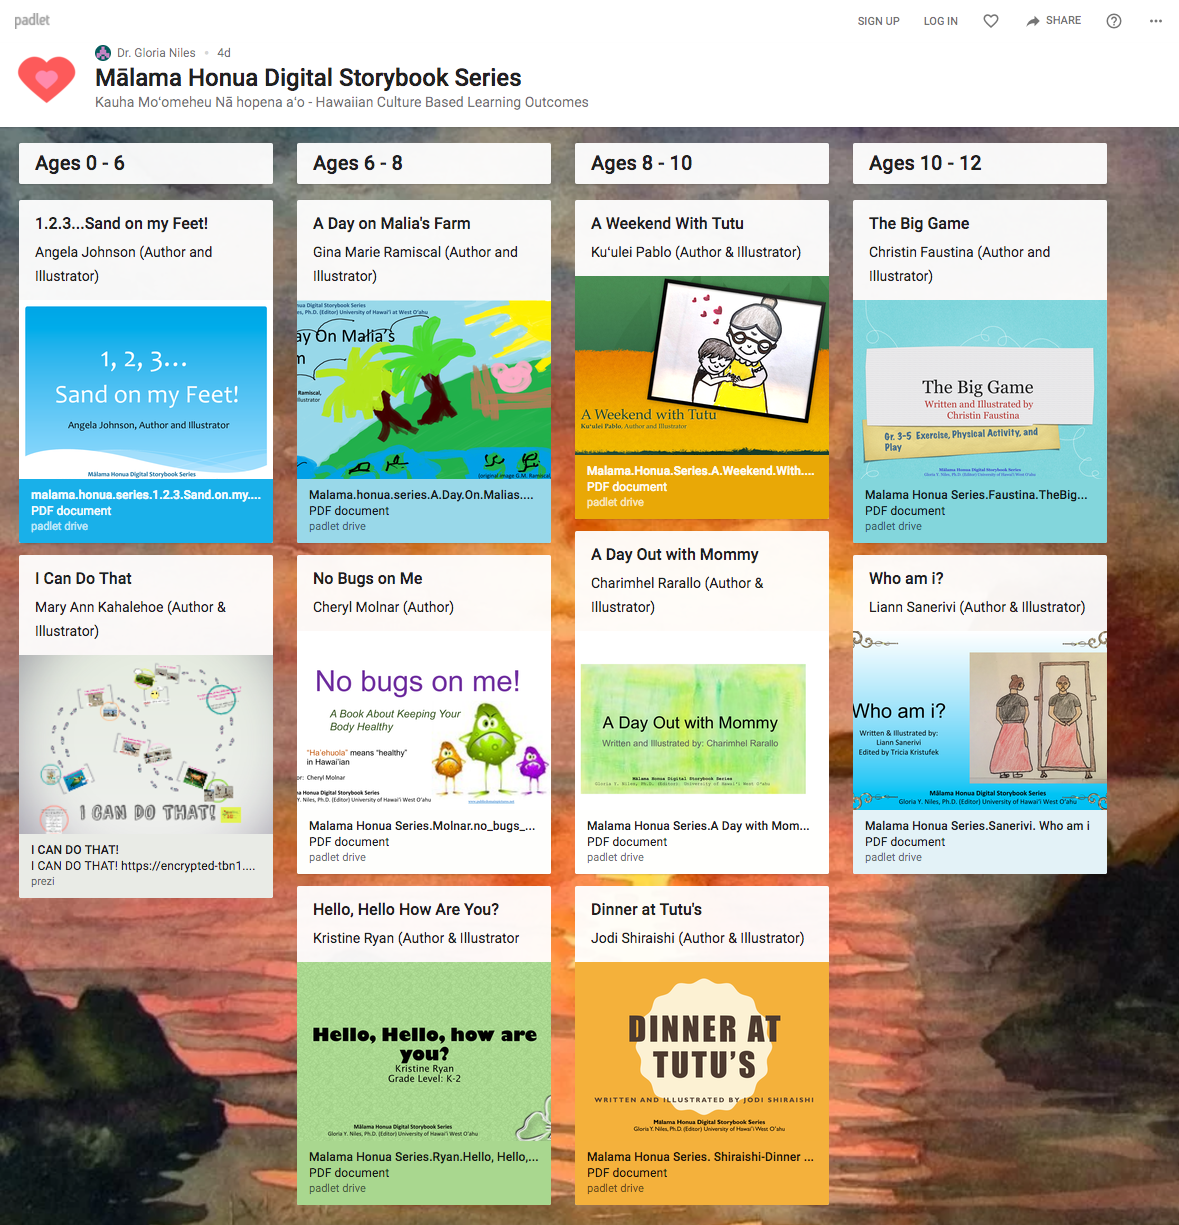 Mālama Honua Digital Storybook Series Dashboard